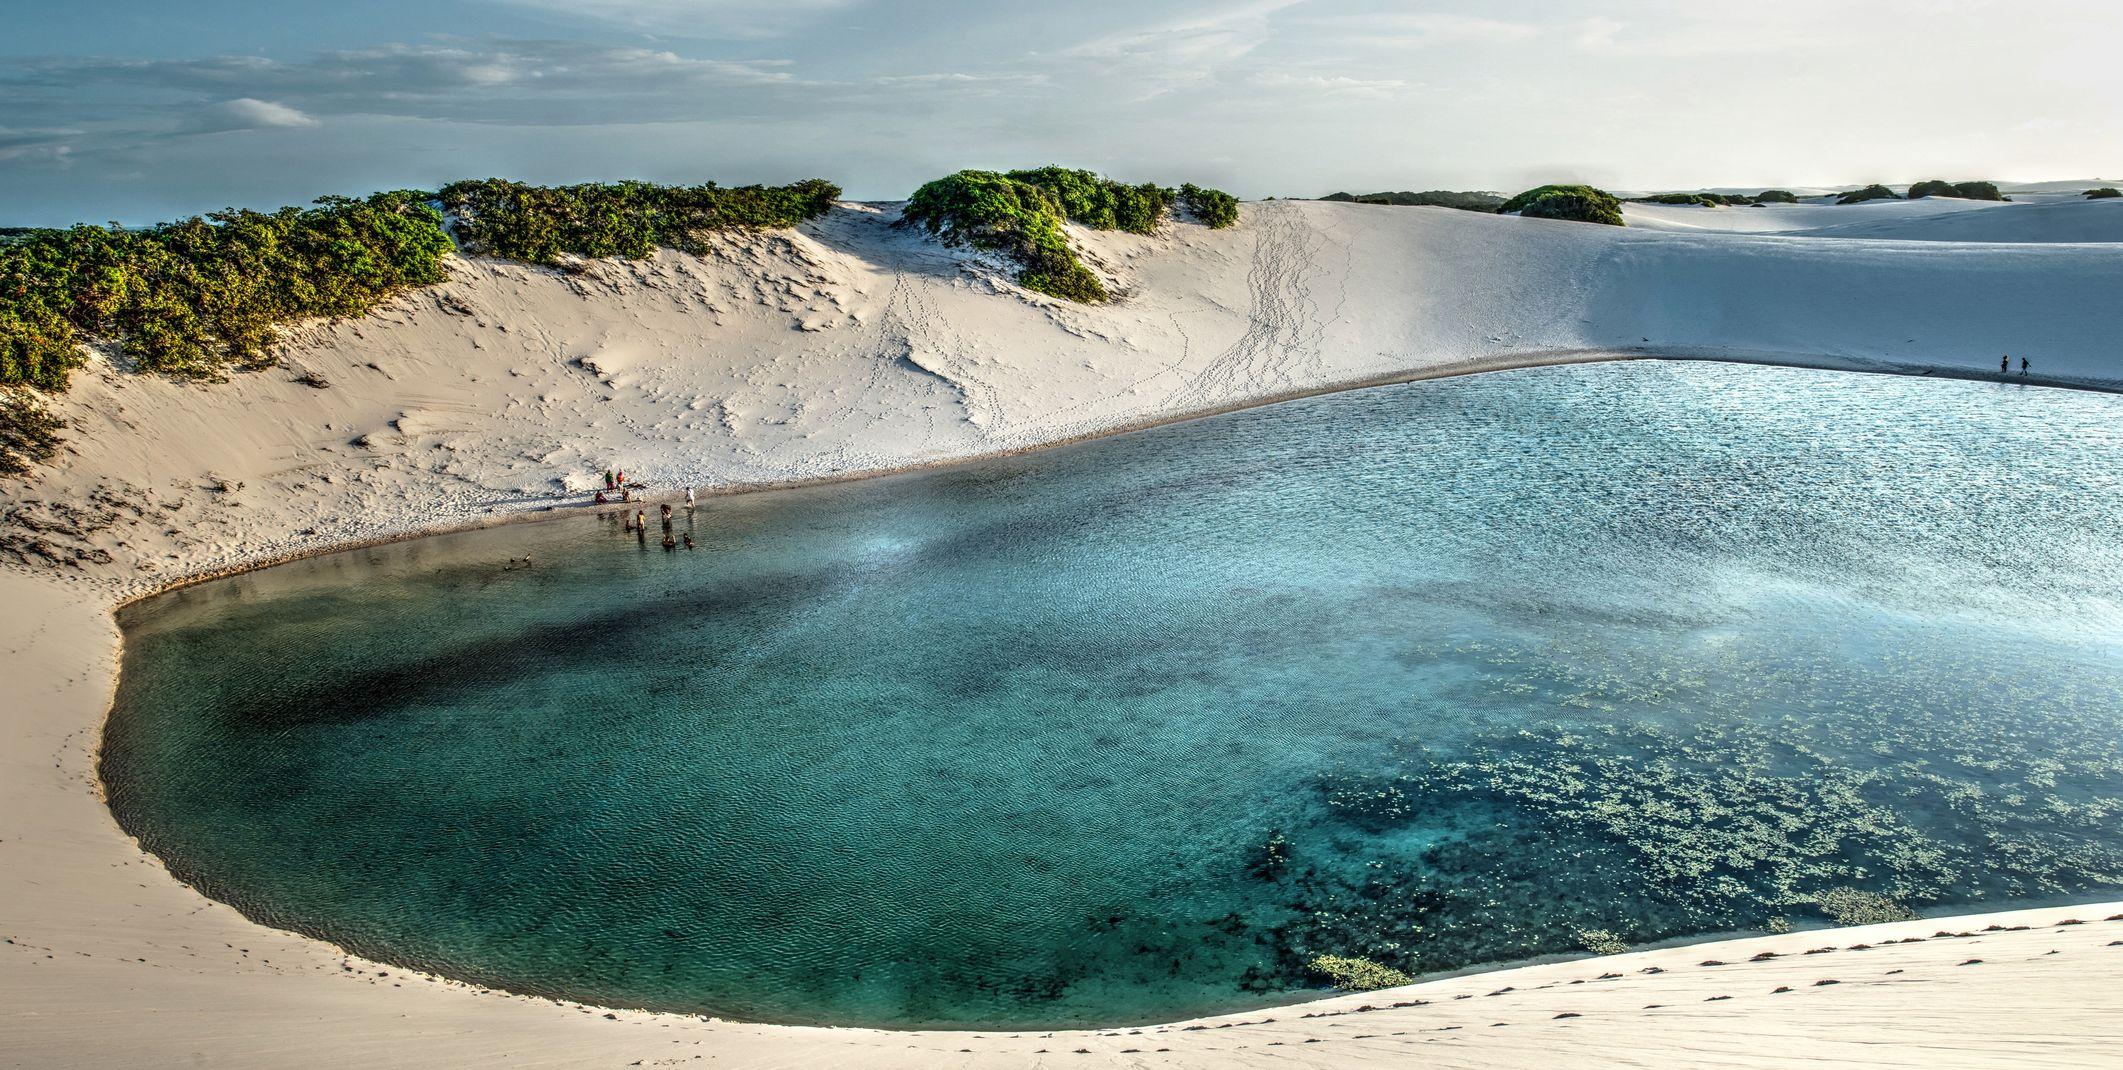 Lagoon in the dunes